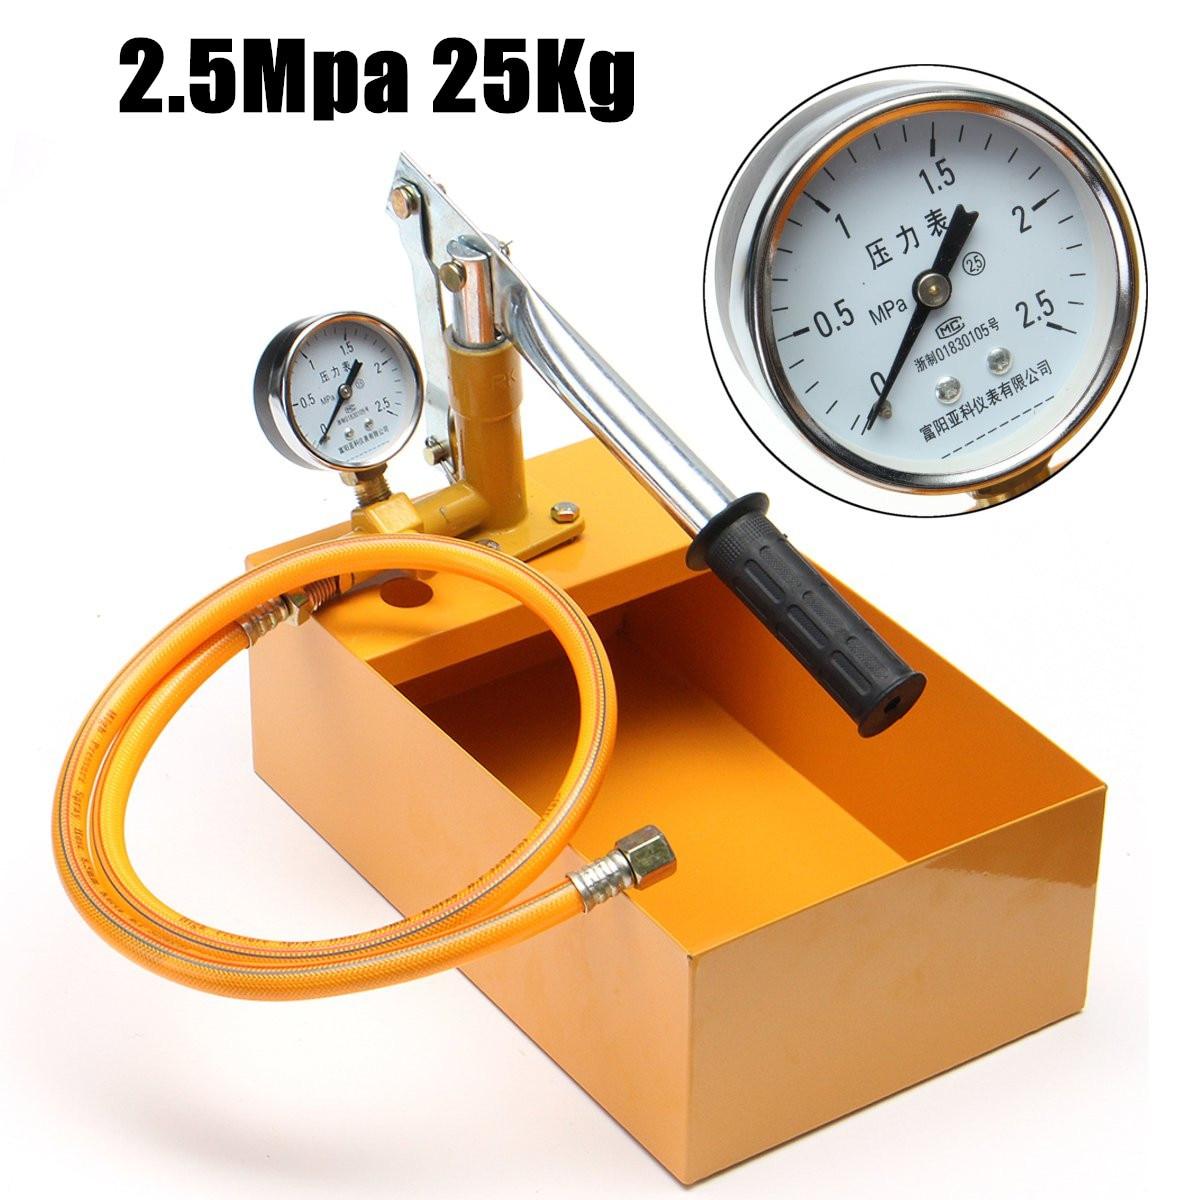 ZEAST 2.5Mpa 25kg Manual Water Pipe Pressure Test Pump Measuring Tool Suitable for Water Hydraulic Oil Pressure Testing Pump